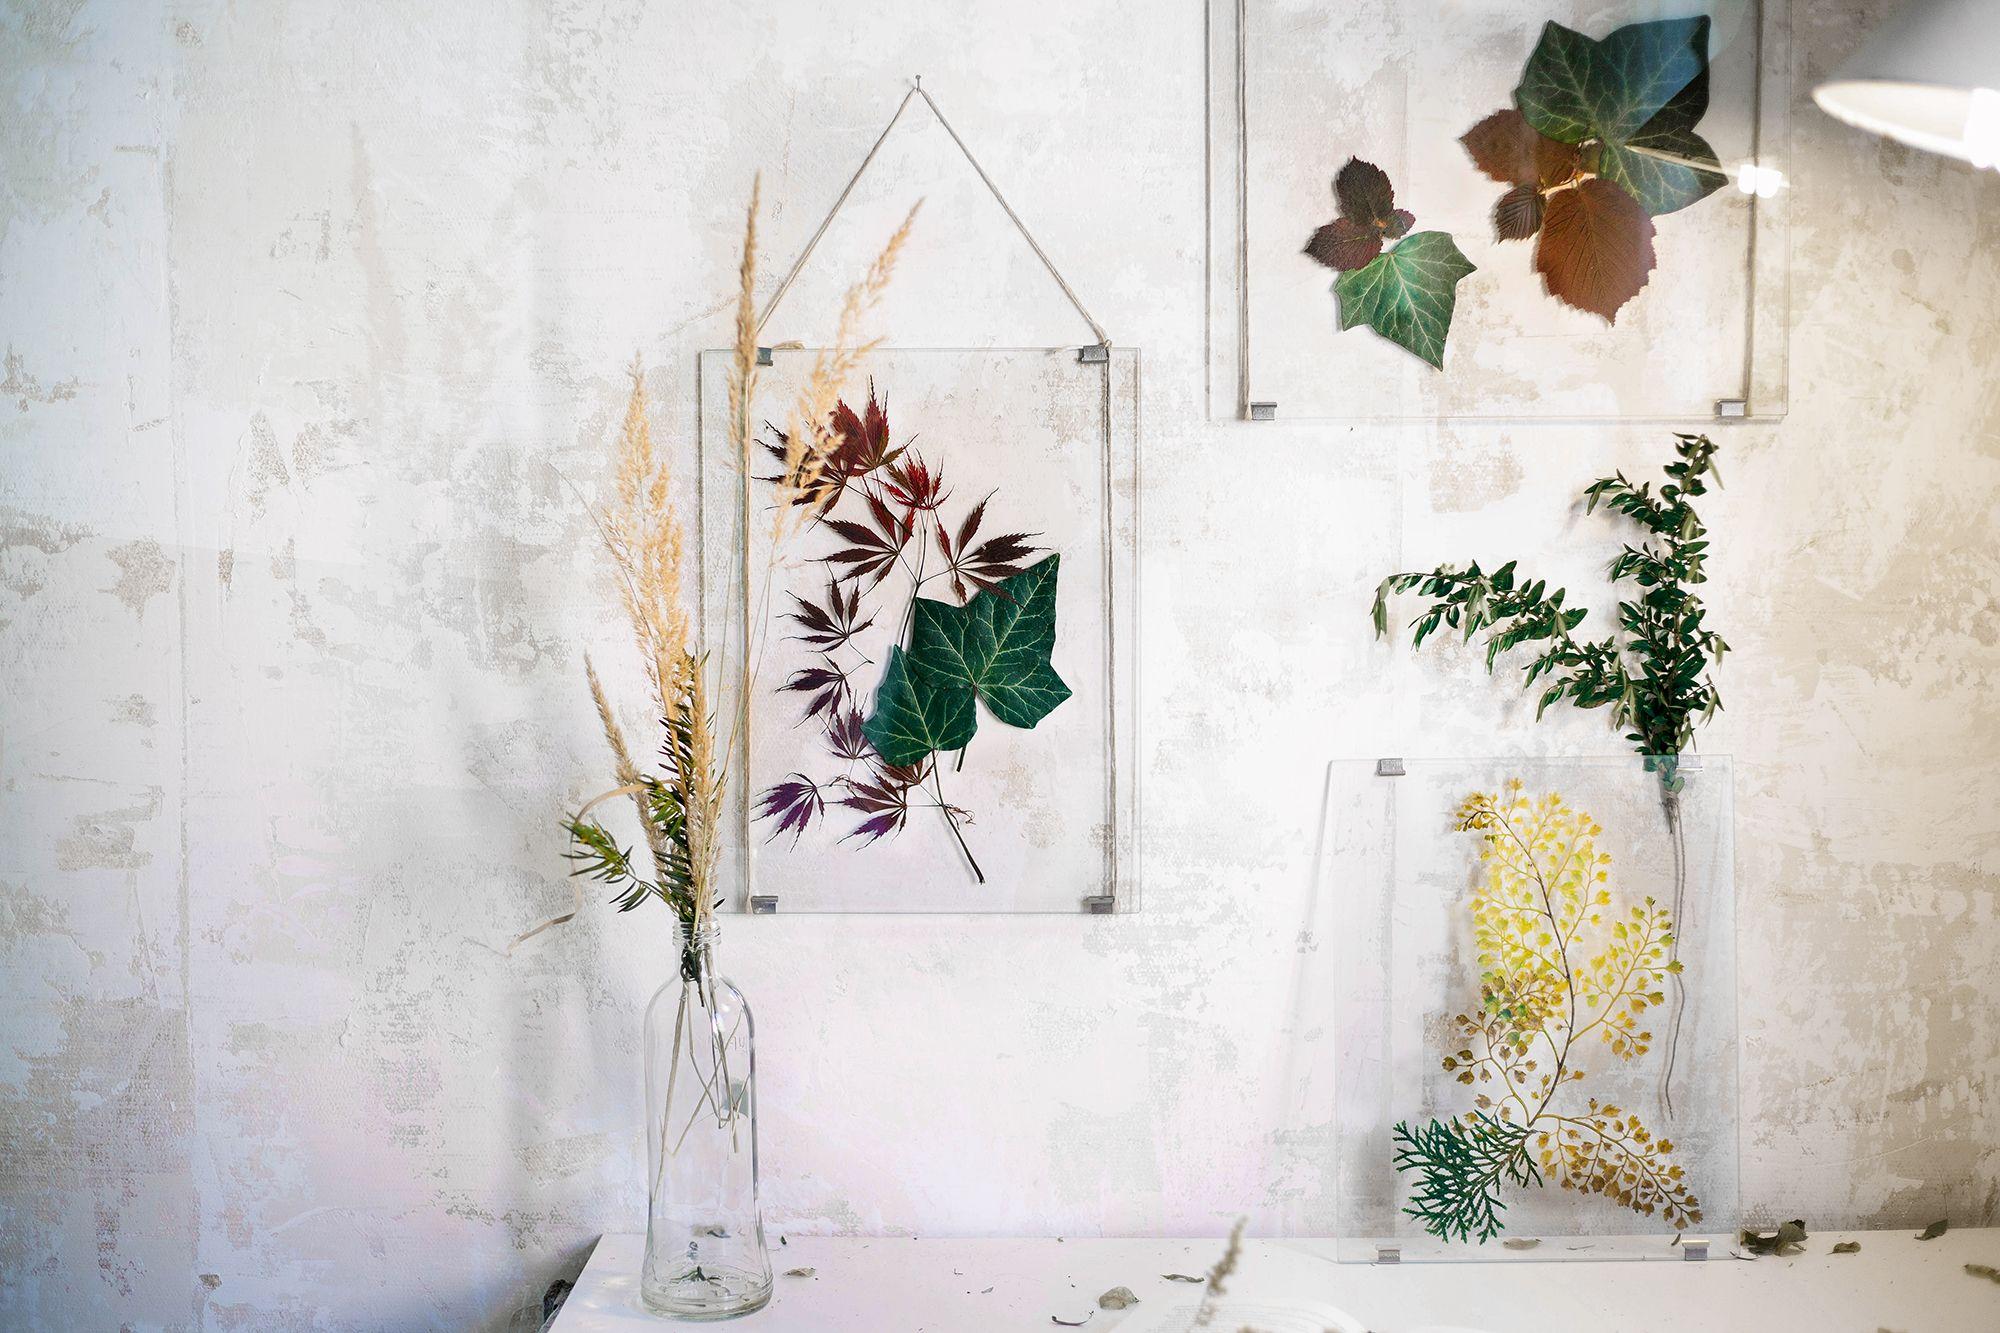 Diy wandgestaltung bl tter im transparenten rahmen do it yourself crafting ideas - Wandgestaltung diy ...